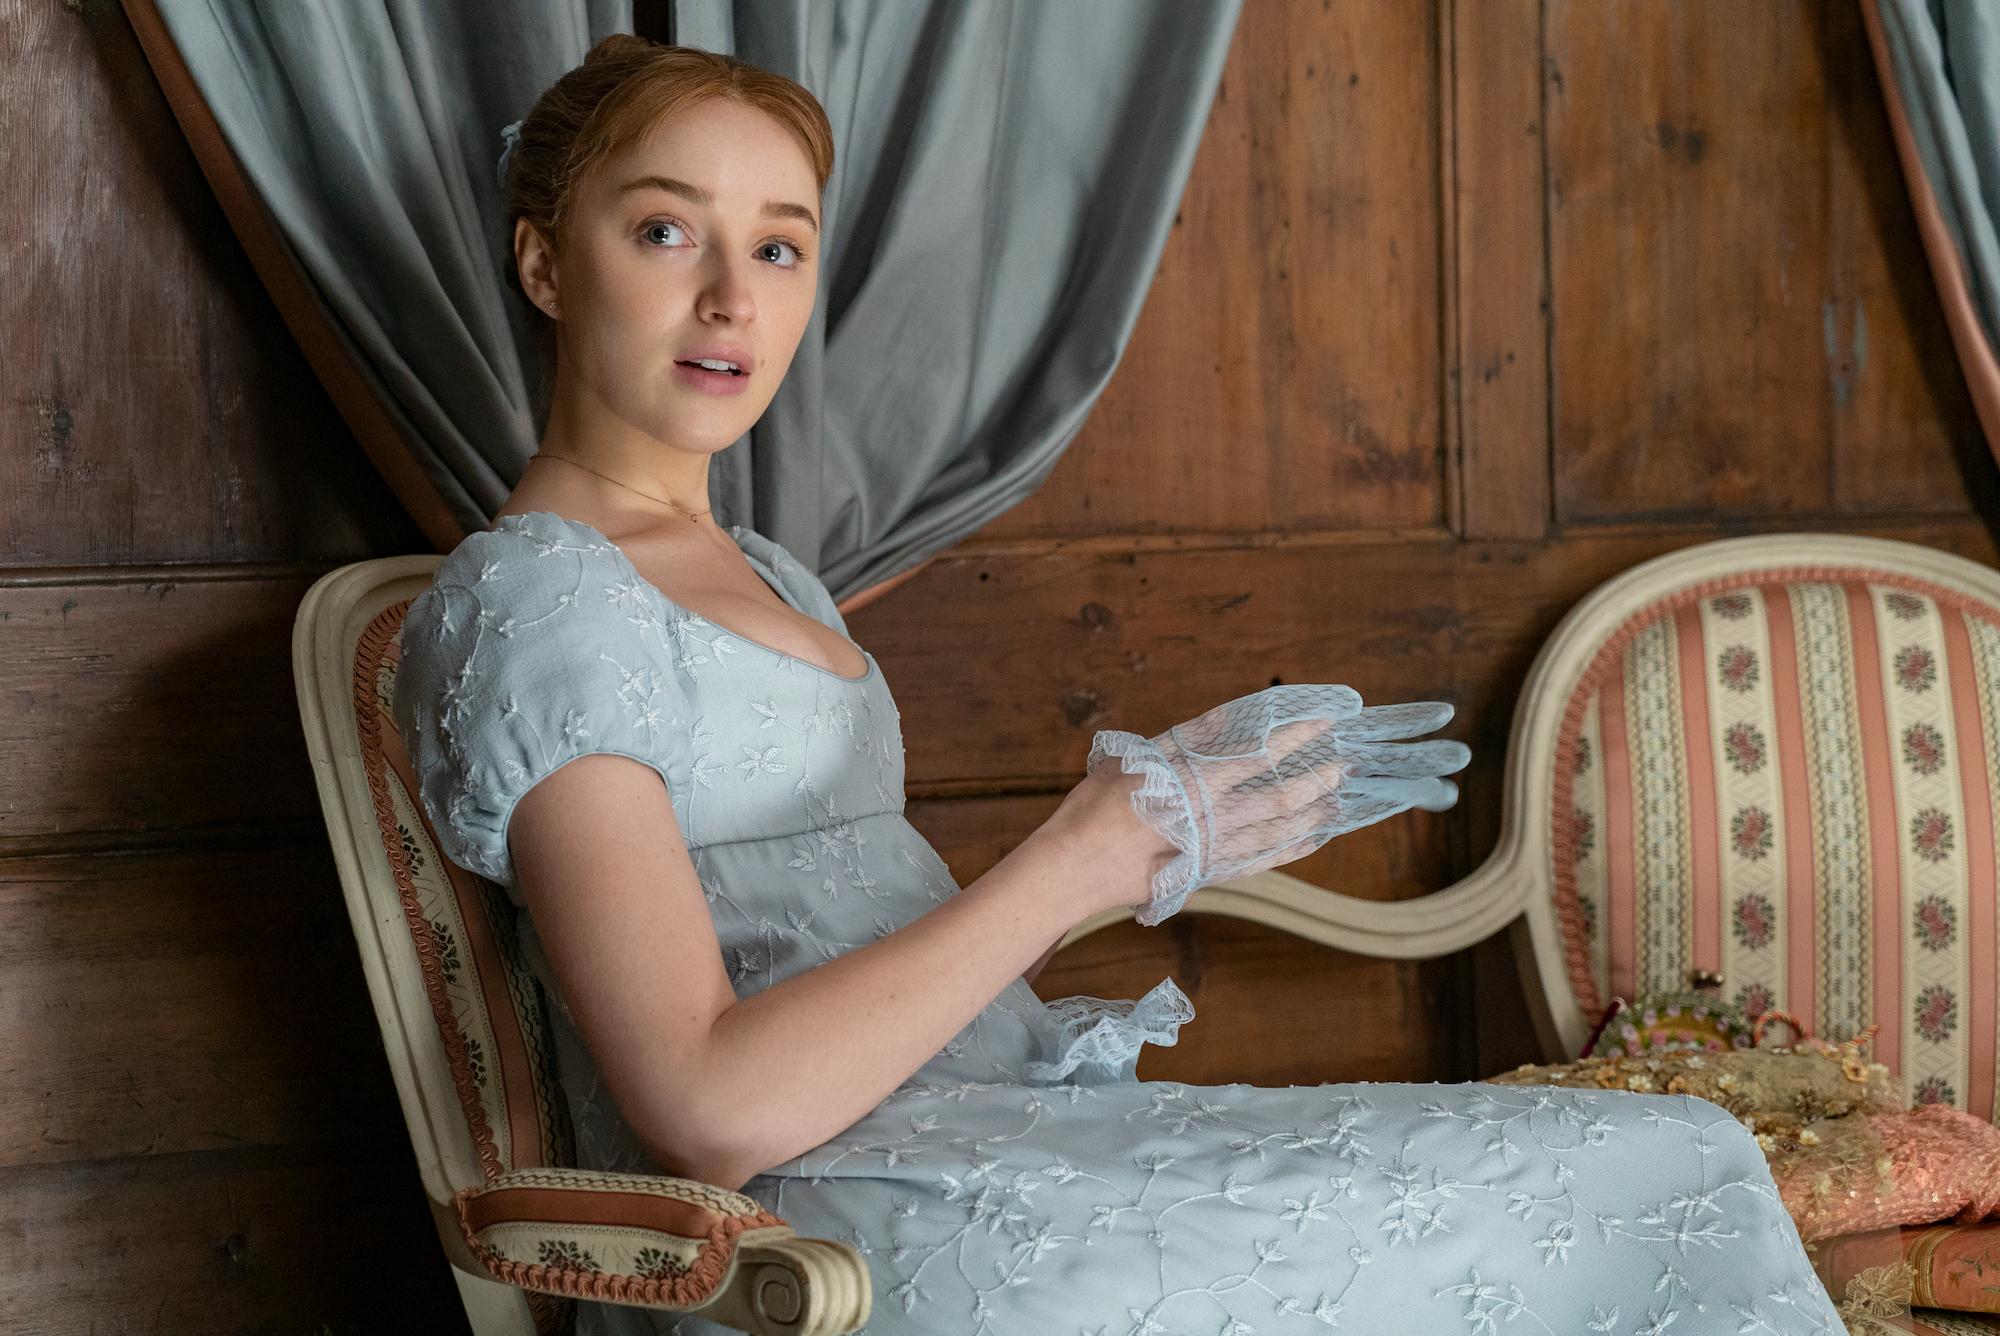 PHOEBE DYNEVOR as DAPHNE BRIDGERTON in episode 102 of 'BRIDGERTON'